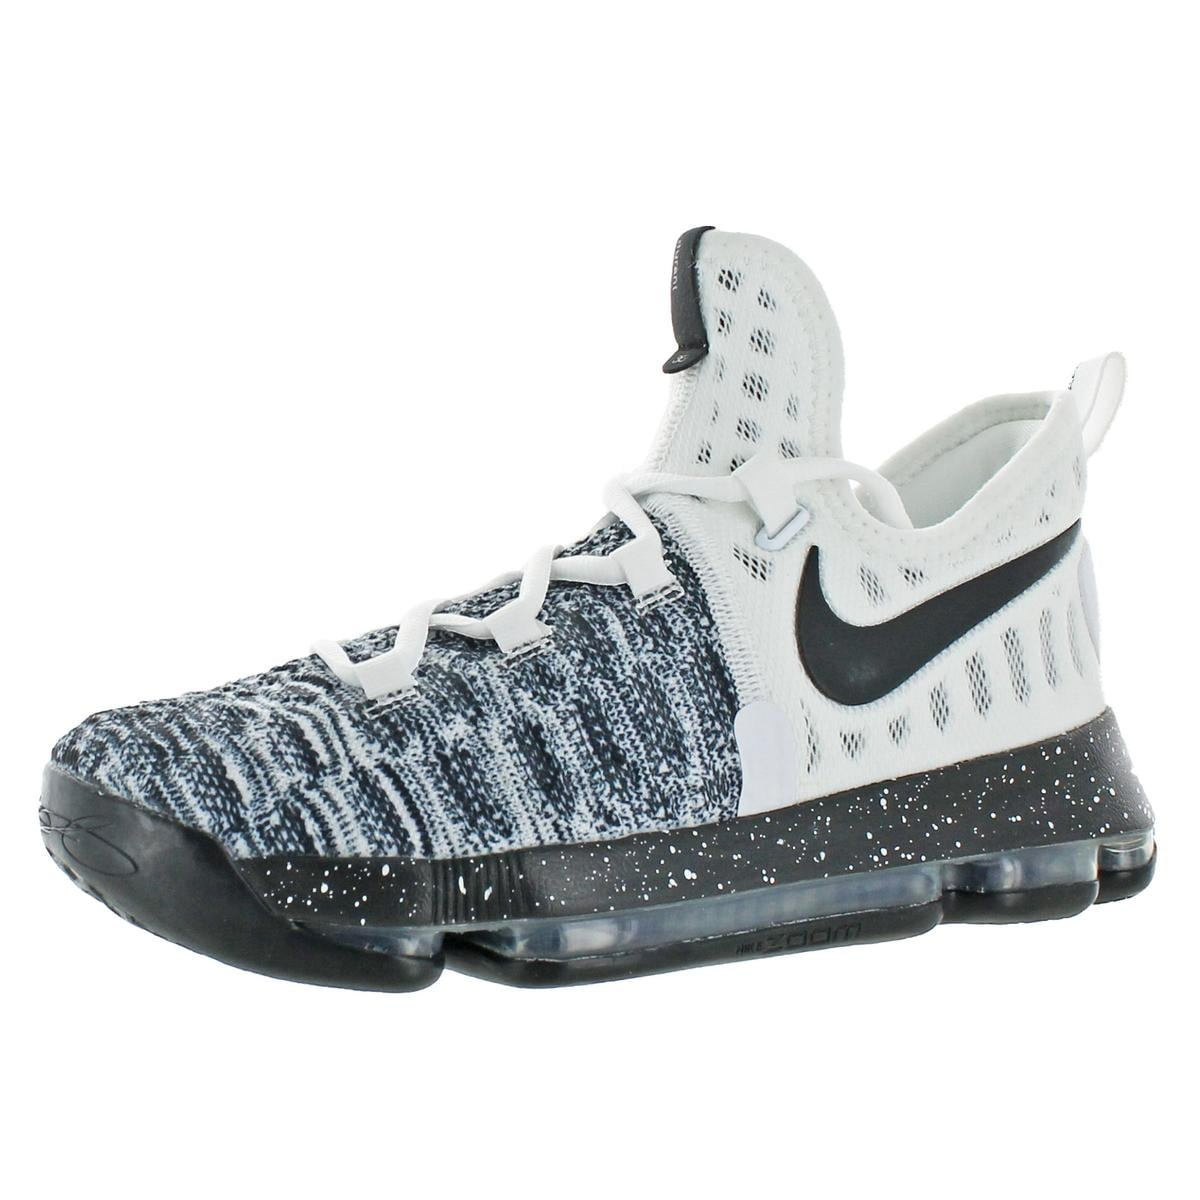 low priced 340b4 1ec8f Nike Boys Zoom KD9 Basketball Shoes Big Kid Textured